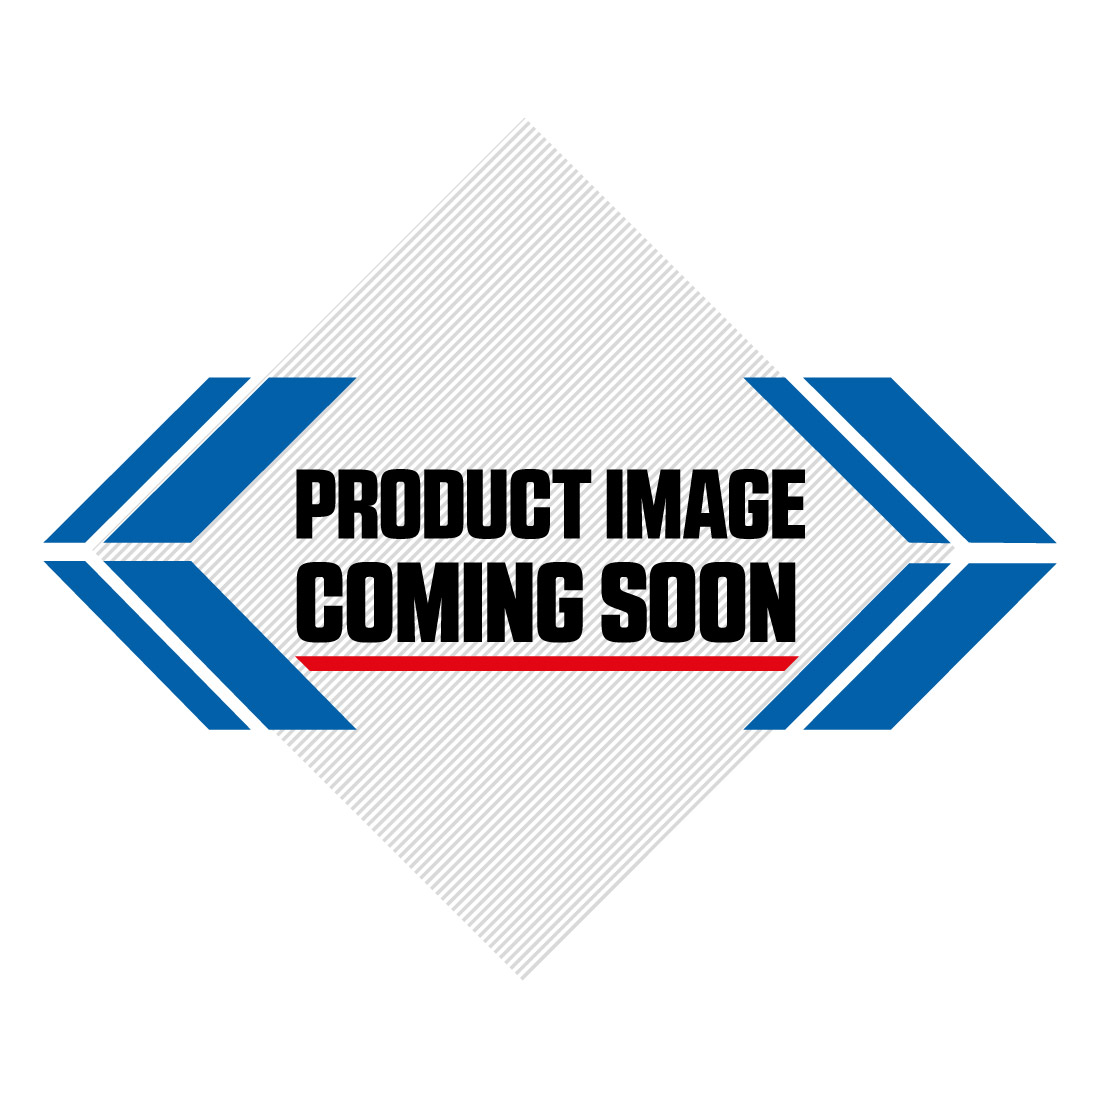 Honda Plastic Kit CRF 250 (14-17) CRF 450 (13-16) OEM Factory Image-2>